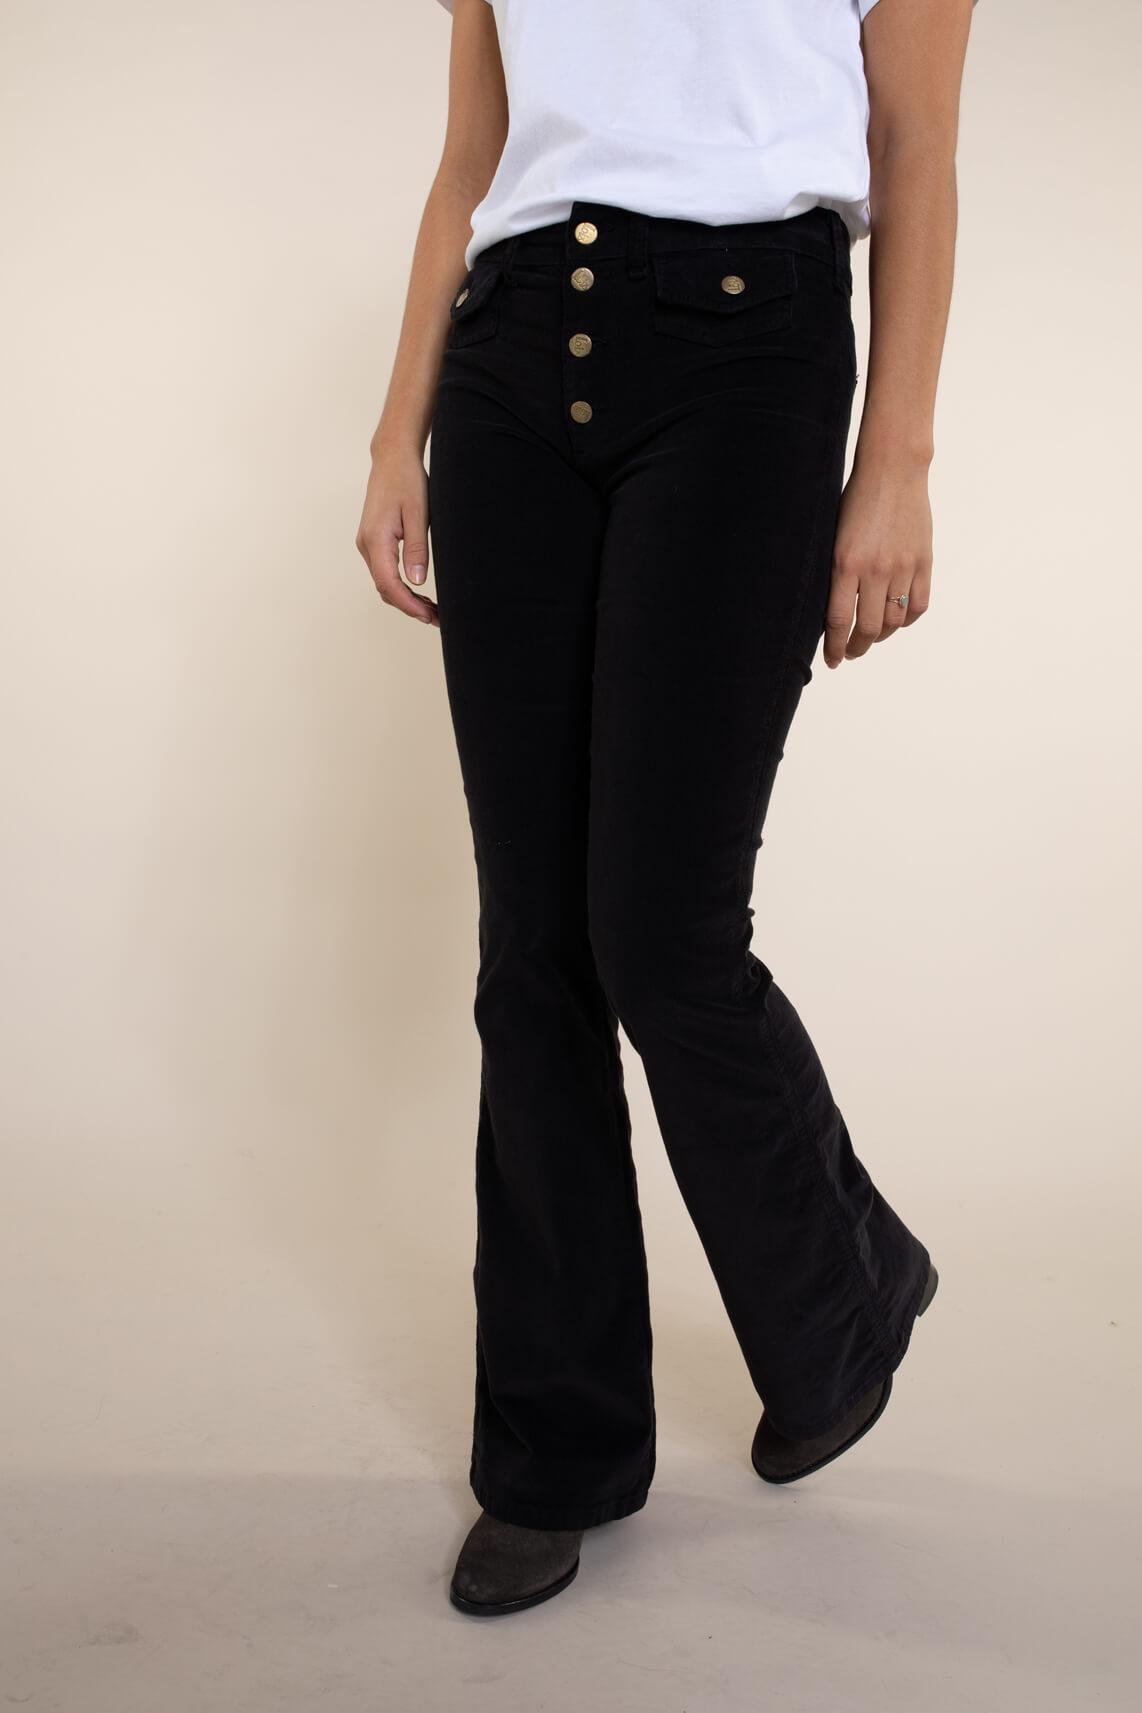 Lois Dames L34 Yoko broek zwart